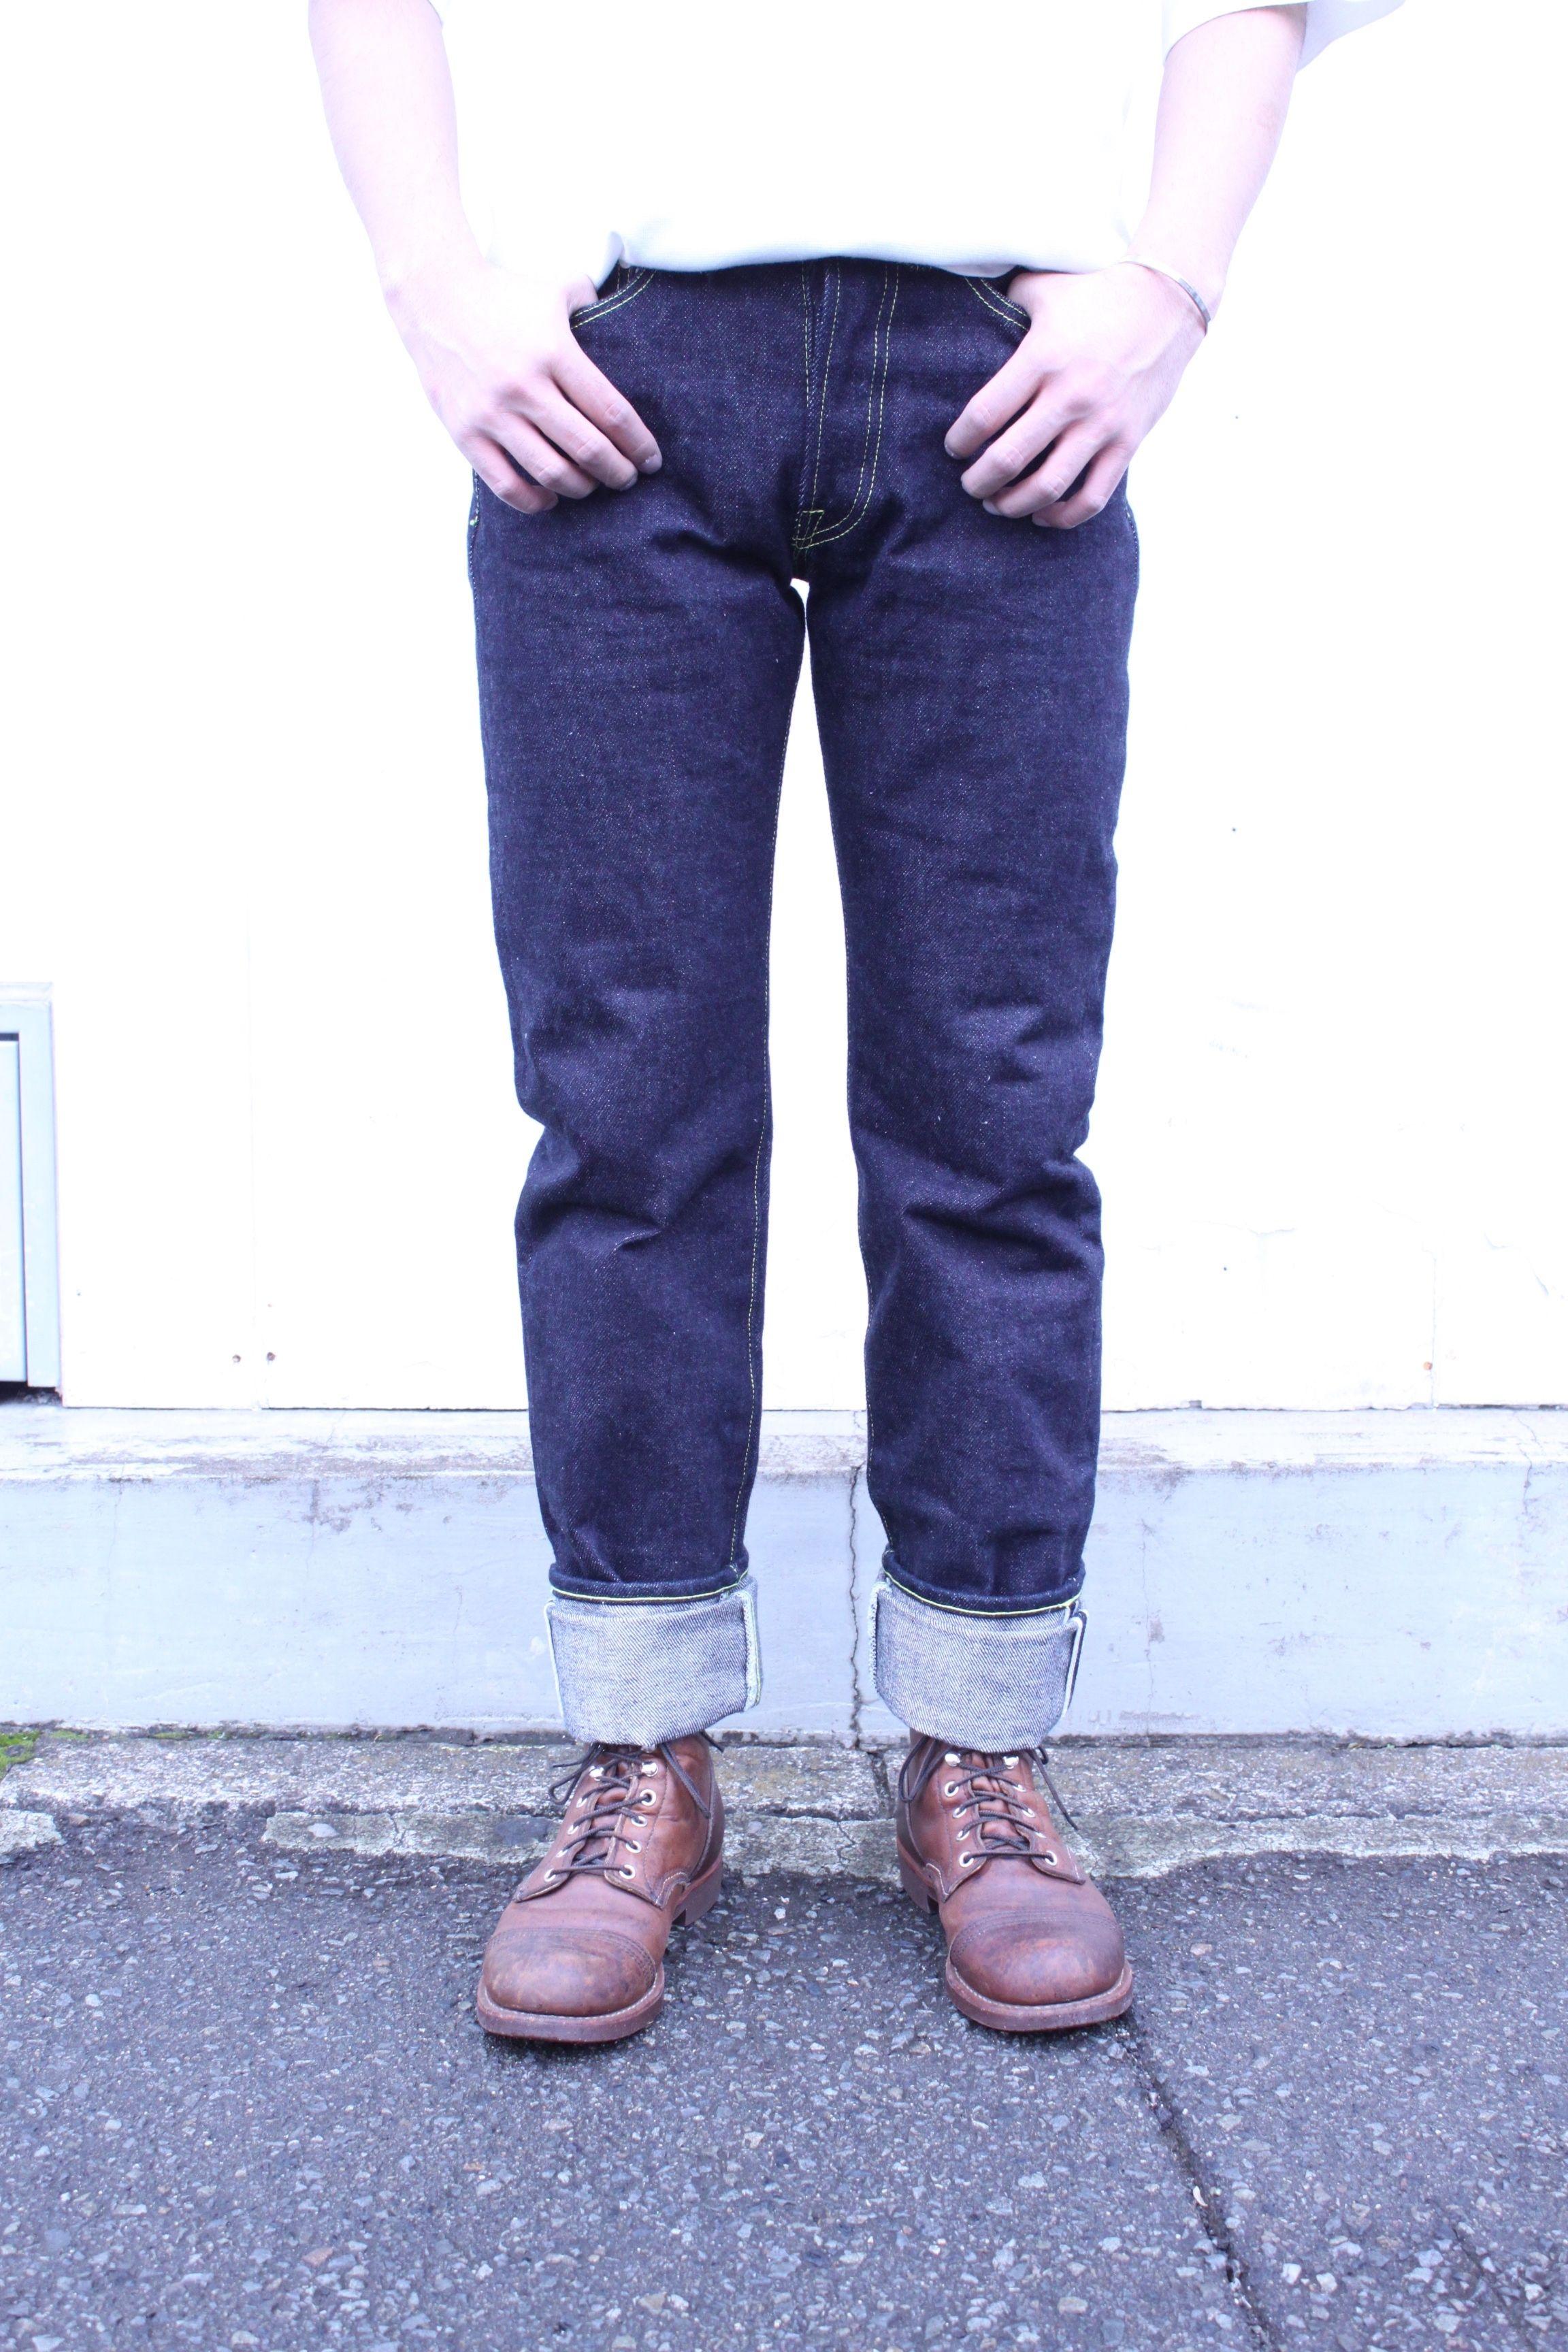 Samurai S710XX25OZGDB GDB Memorial Jeans